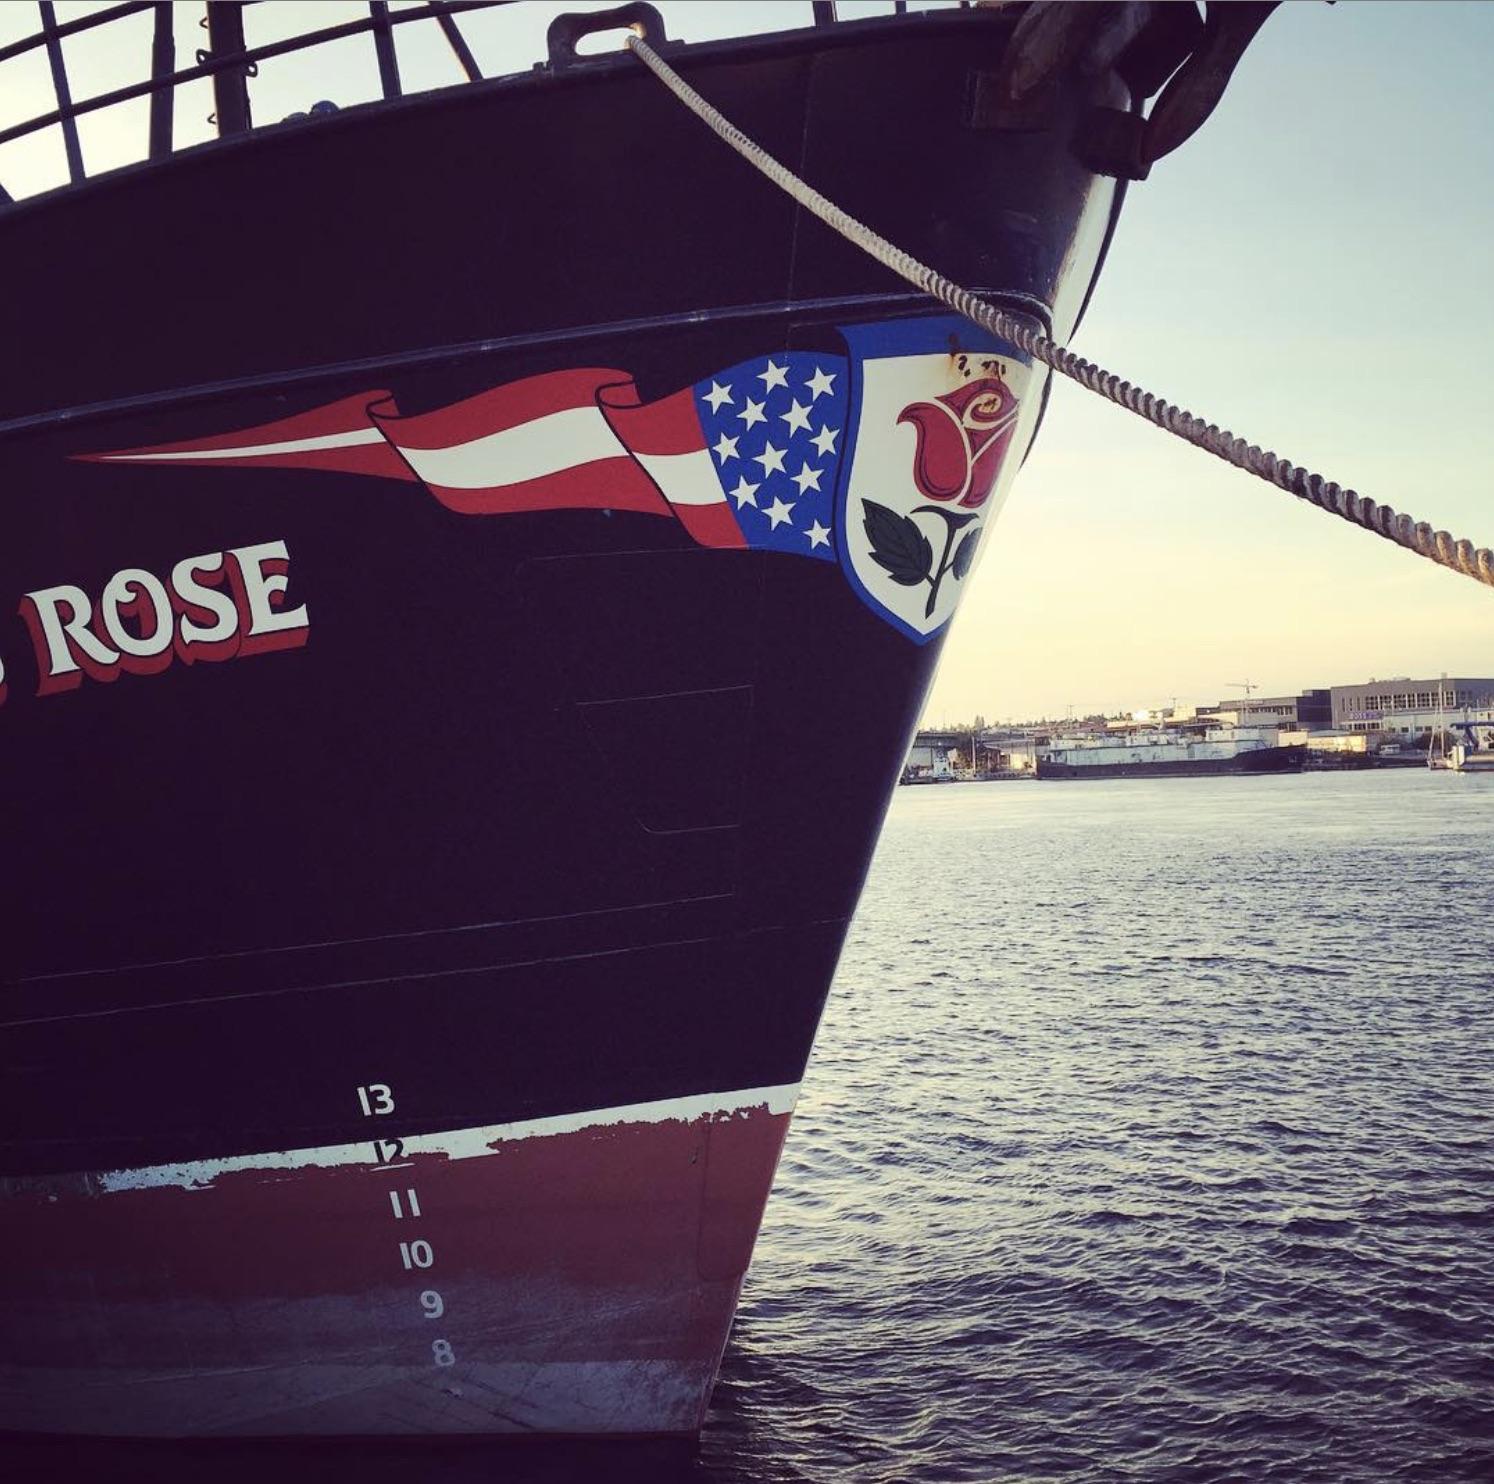 Deadliest Catch, Scandies Rose-https://www.instagram.com/p/BK4aRGnDveI/